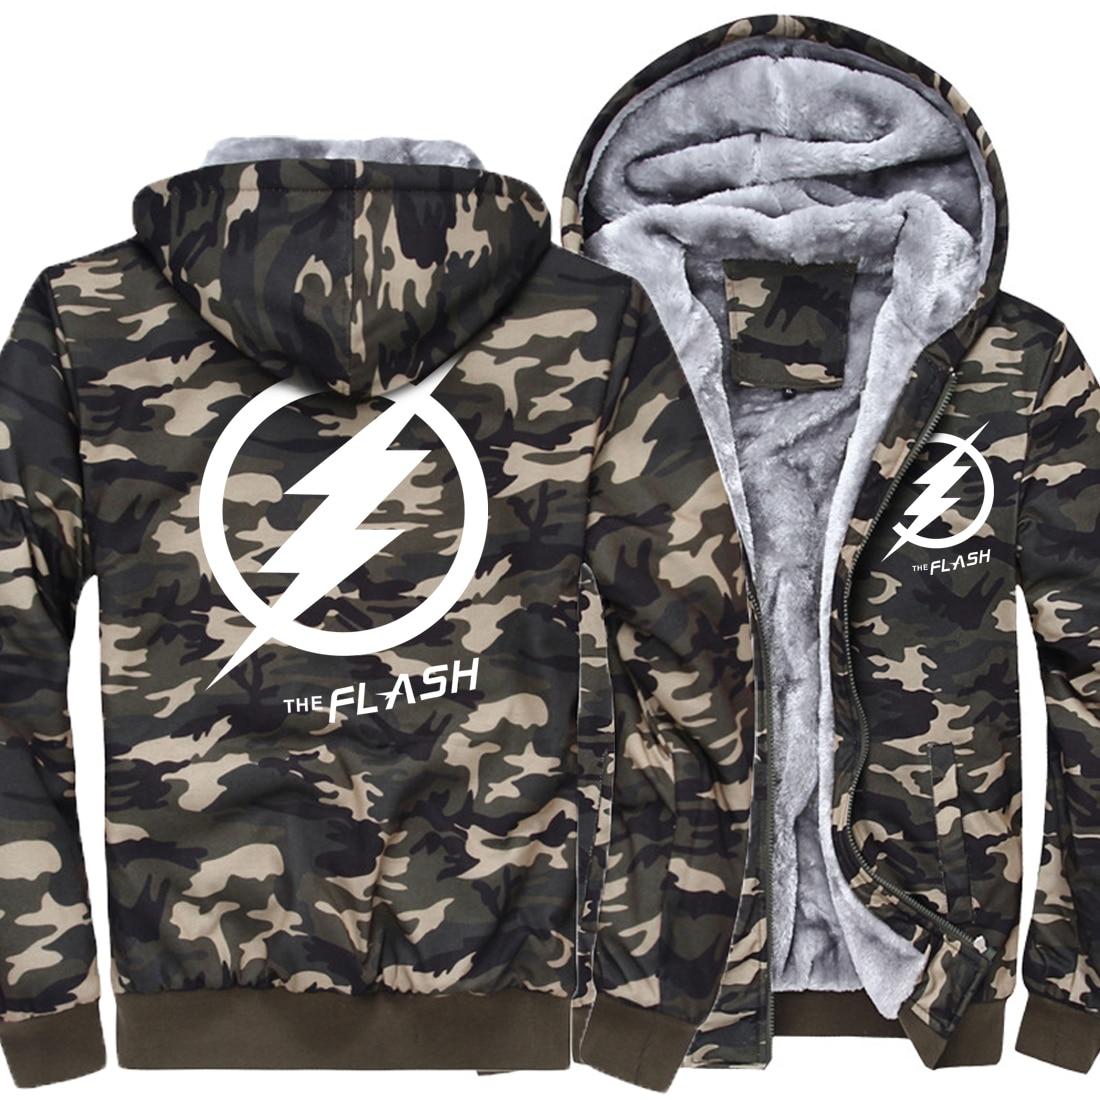 THE FLASH Fashion Sweatshirts Men 2019 New Arrival Brand Camouflage Hoodies Men Hip Hop Streetwear Hoody Harajuku Tracksuit Kpop